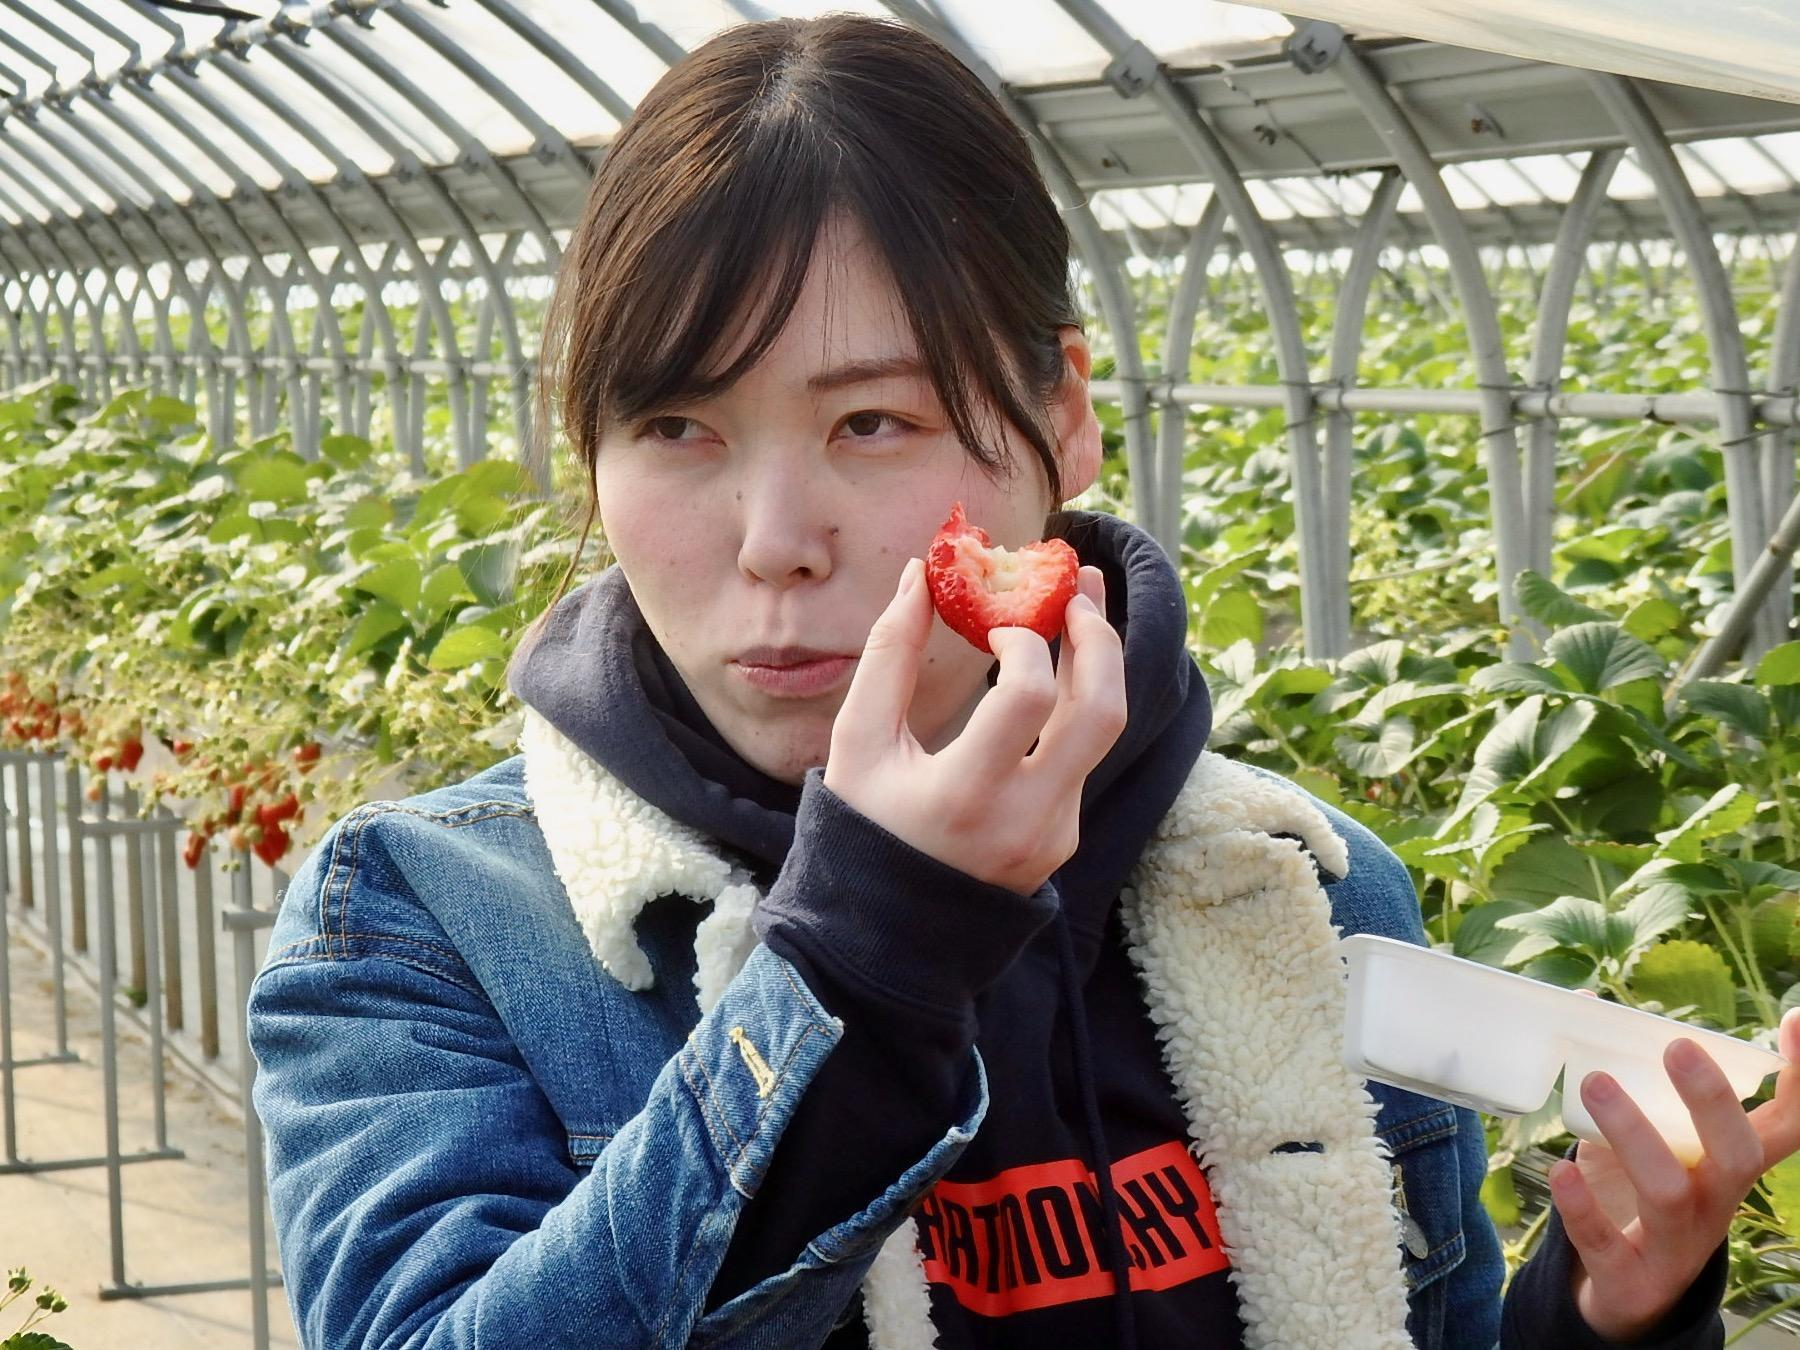 http://news.yoshimoto.co.jp/20190201171110-98b3281f6f8b9eabf52db58f65876124212bea1a.jpeg